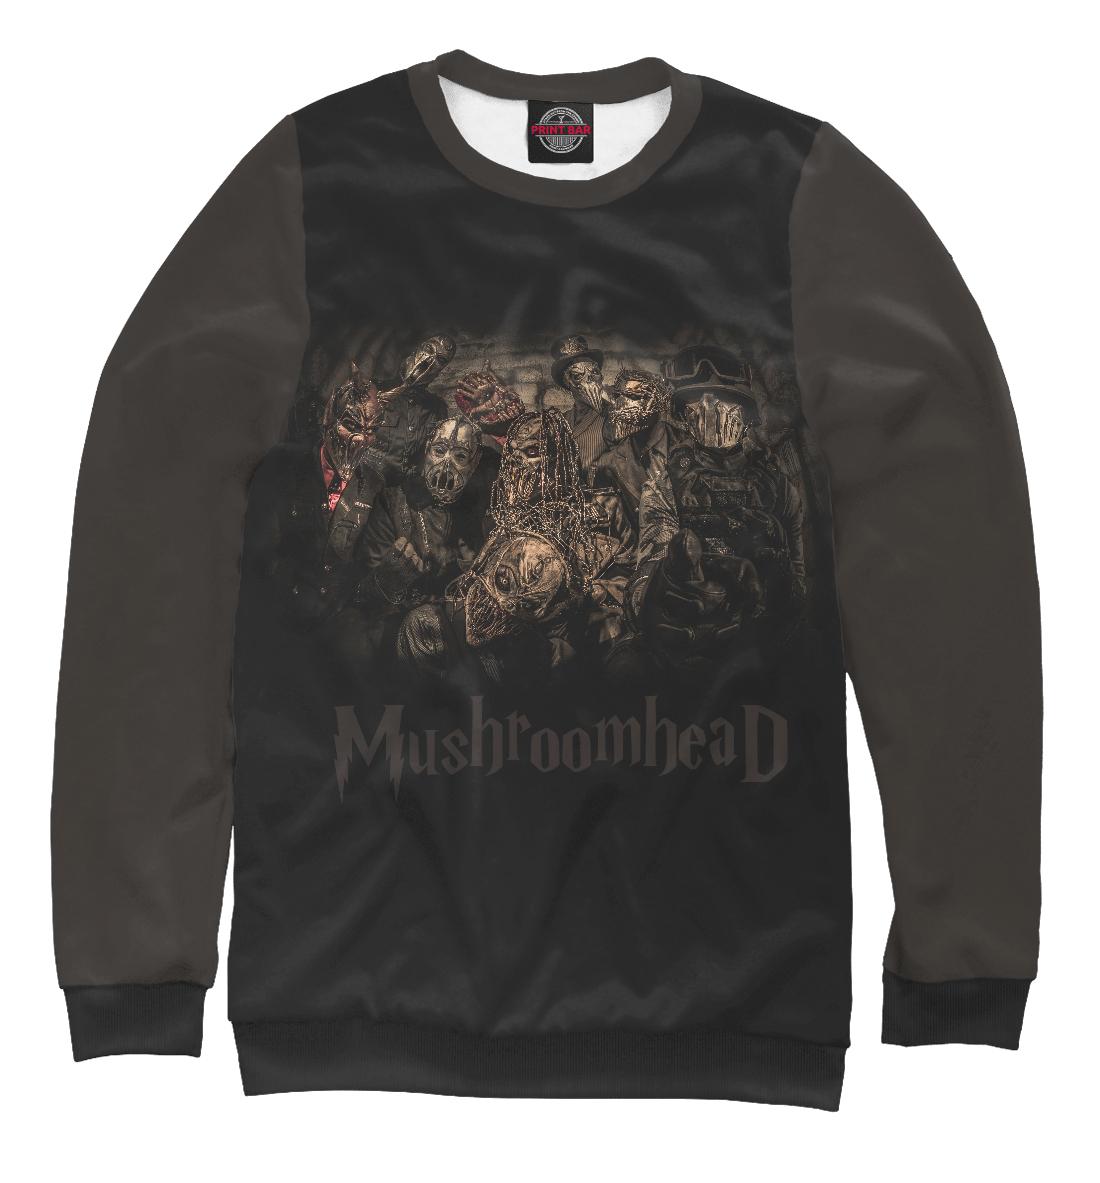 Купить Mushroomhead, Printbar, Свитшоты, MZK-765875-swi-2